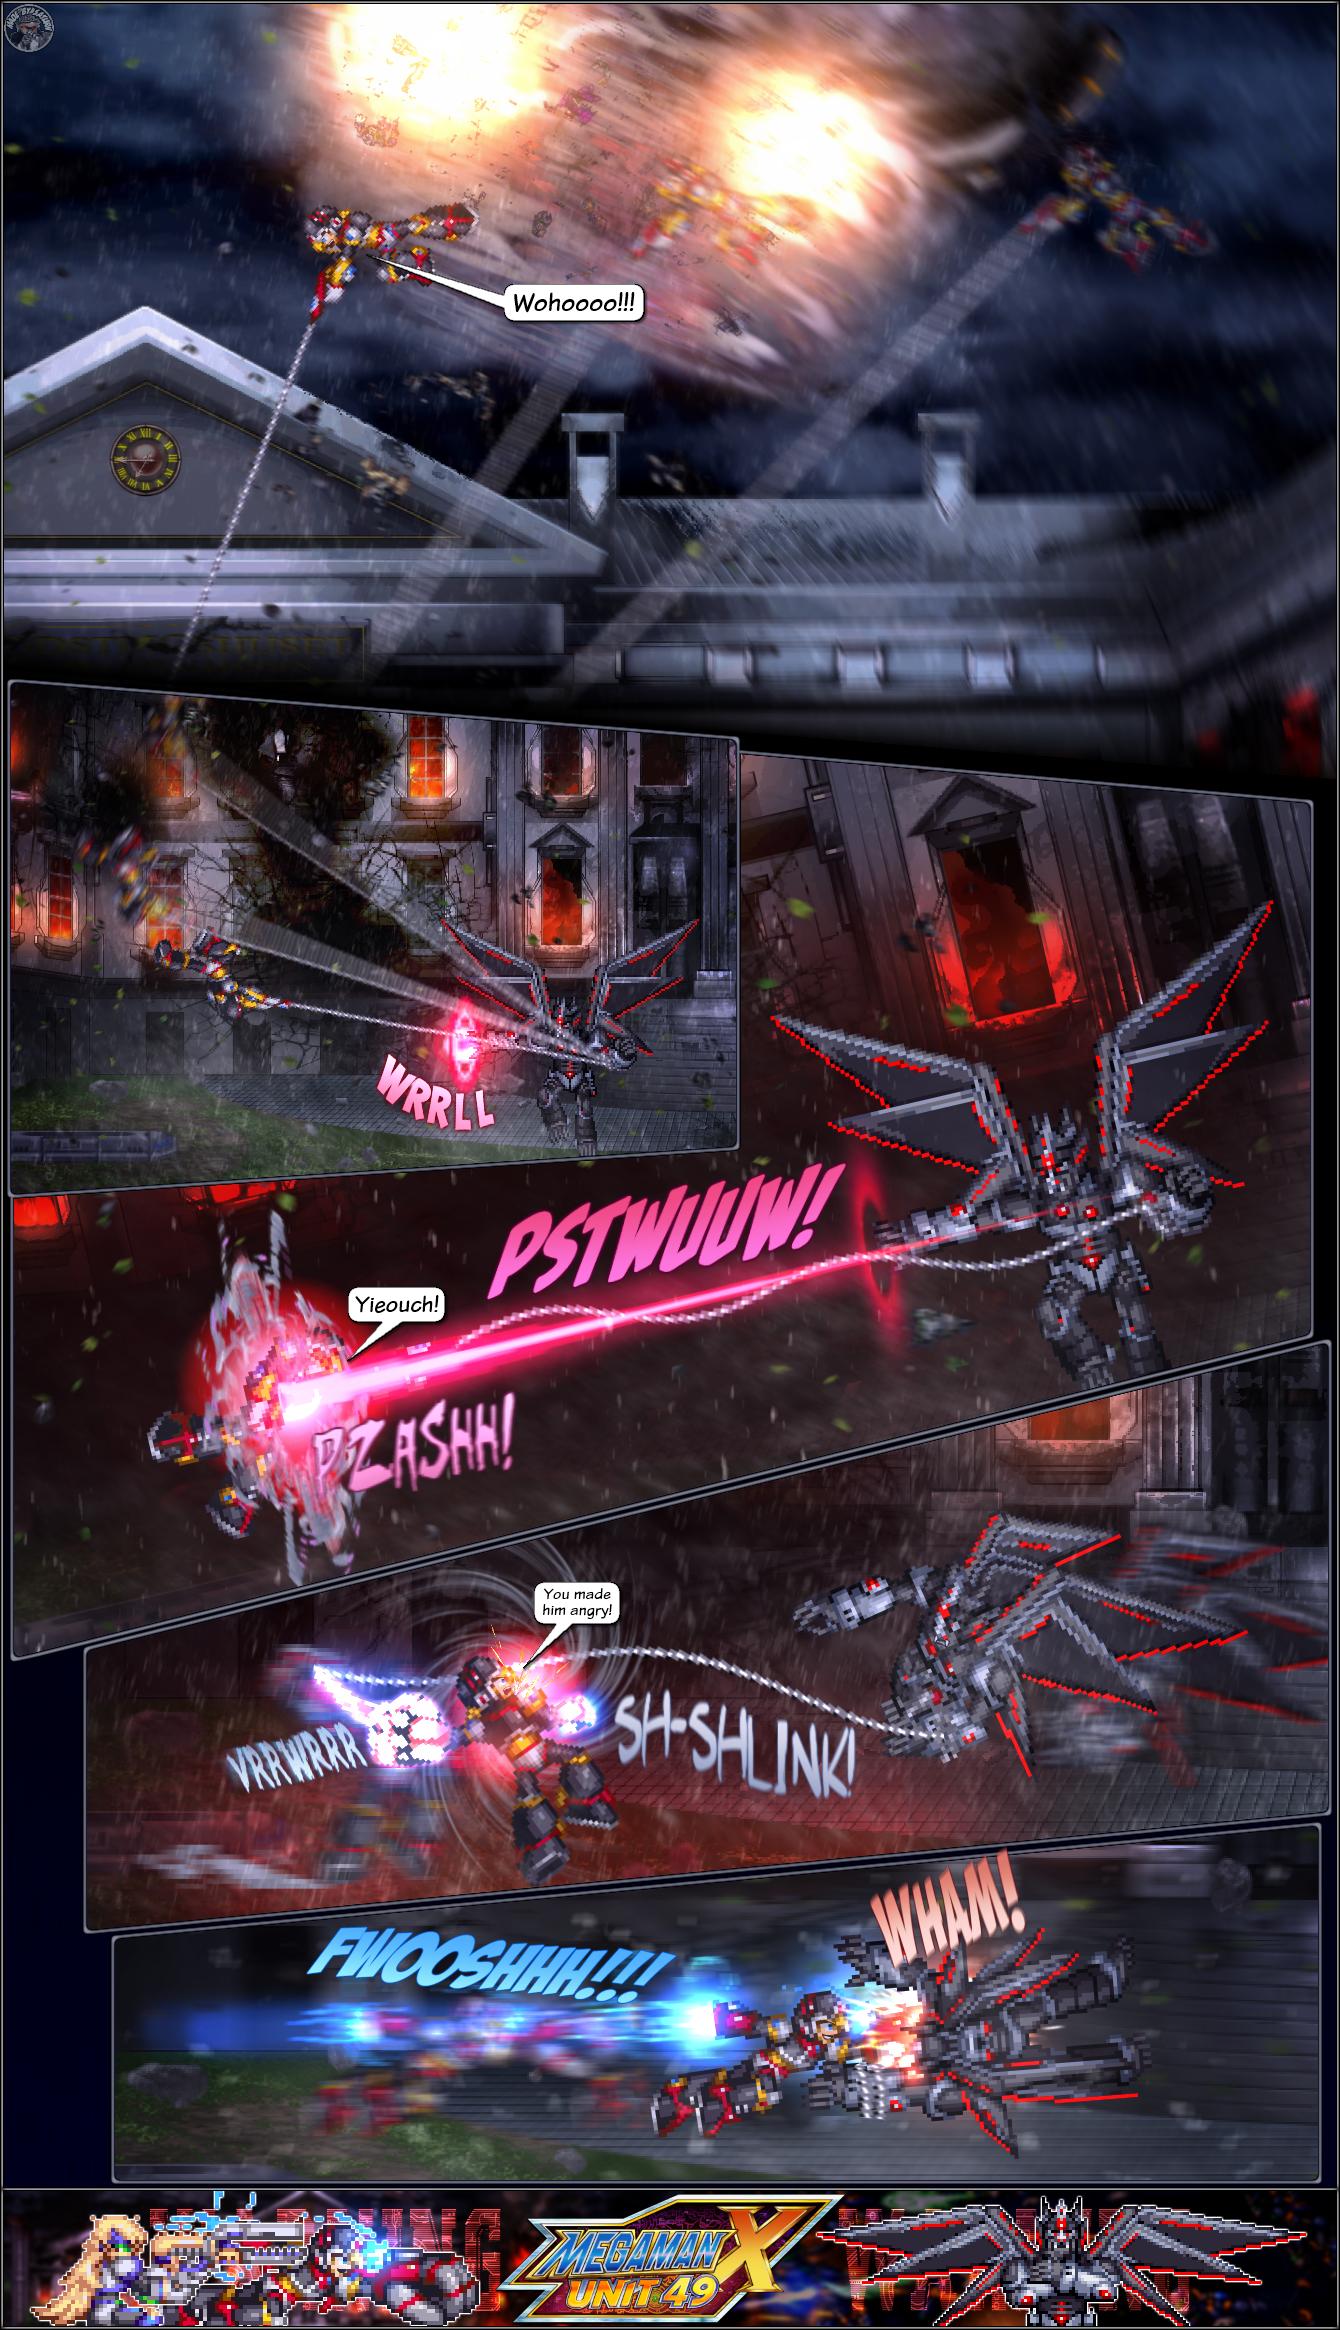 MMXU49 S2C16: Winged Rampage (Pg 39) by IrregularSaturn